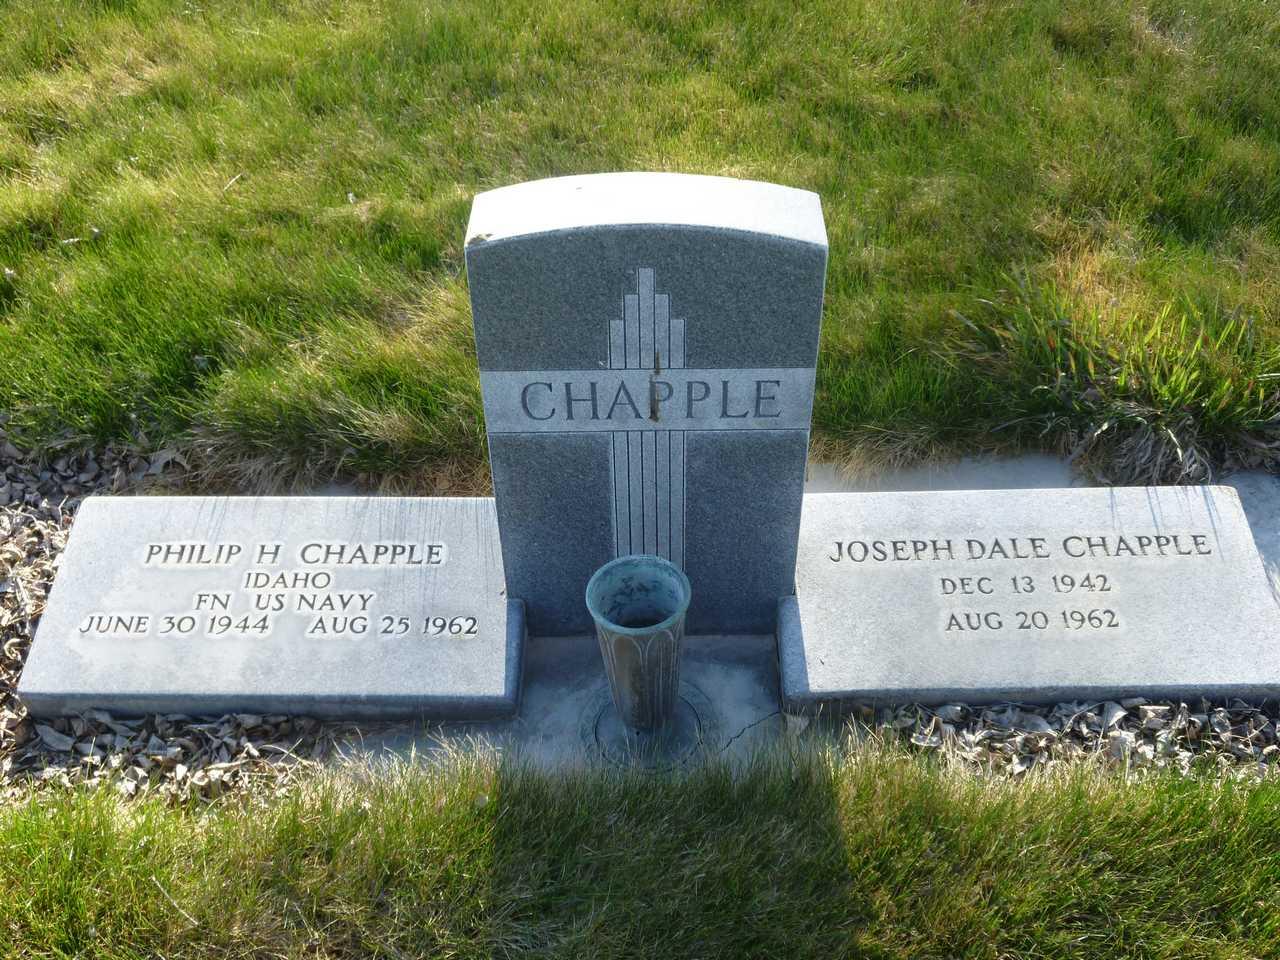 Joseph Dale Chapple, Jr